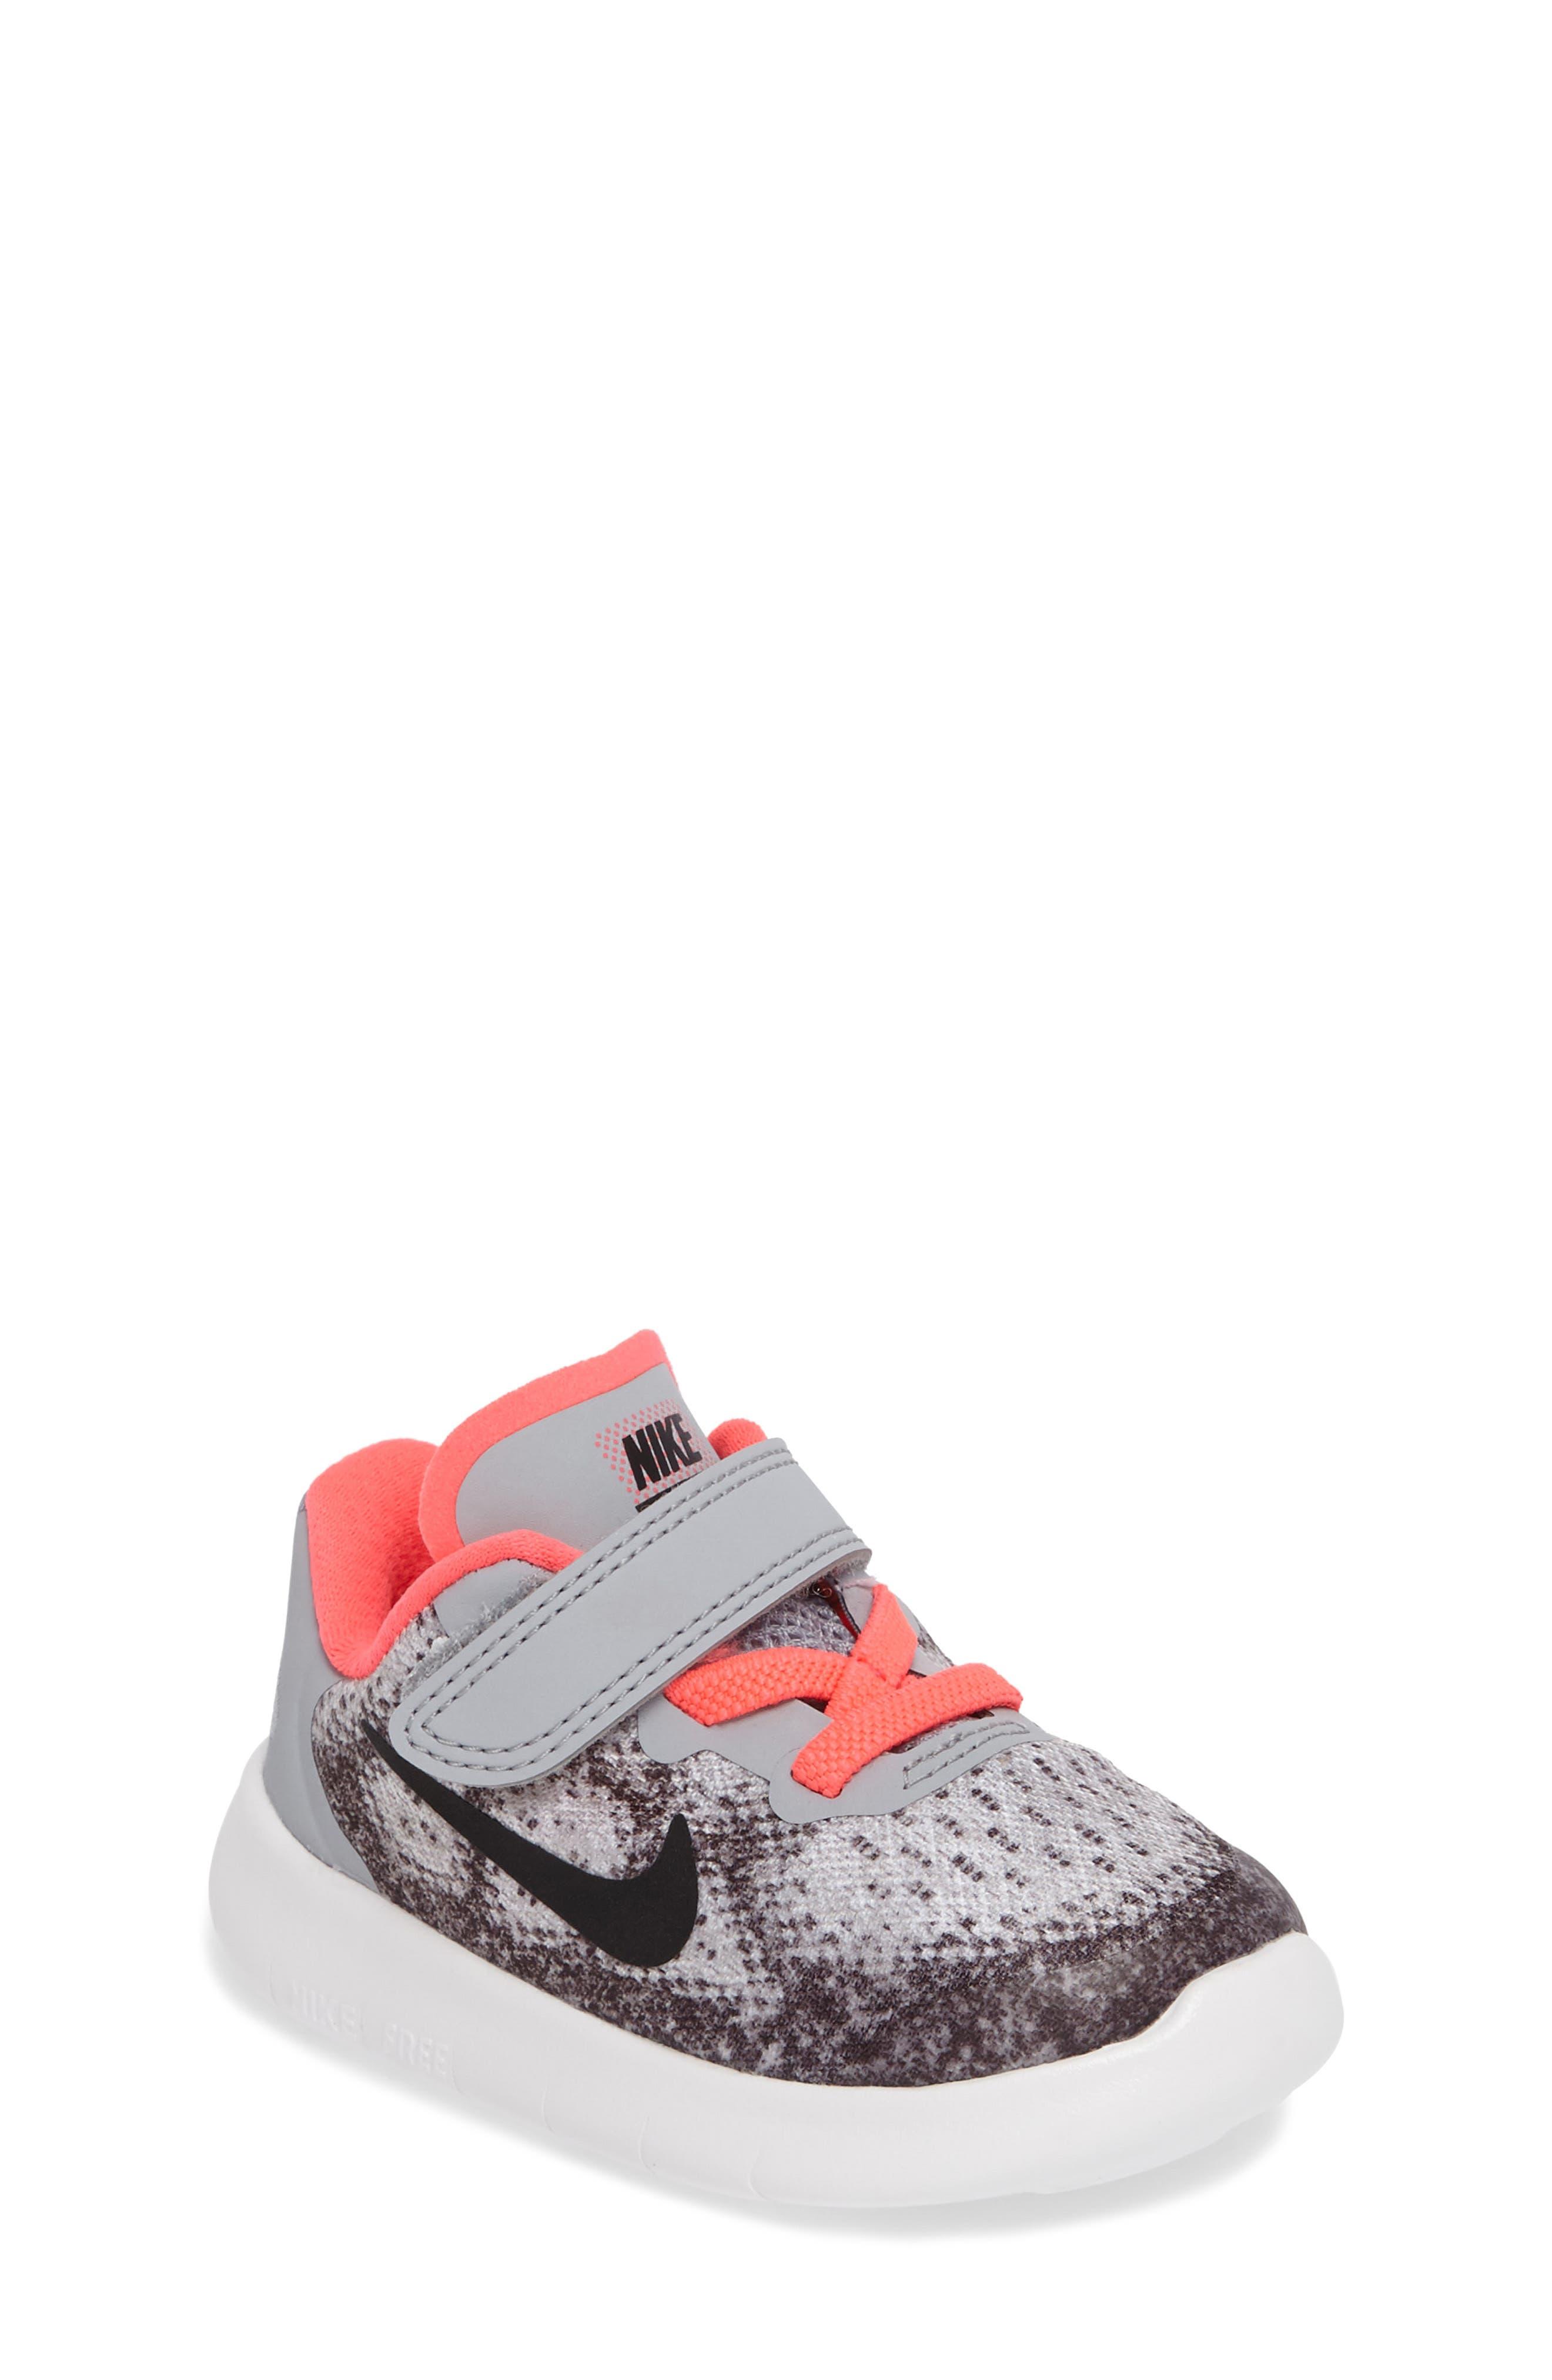 Free Run 2017 Sneaker,                             Main thumbnail 1, color,                             020